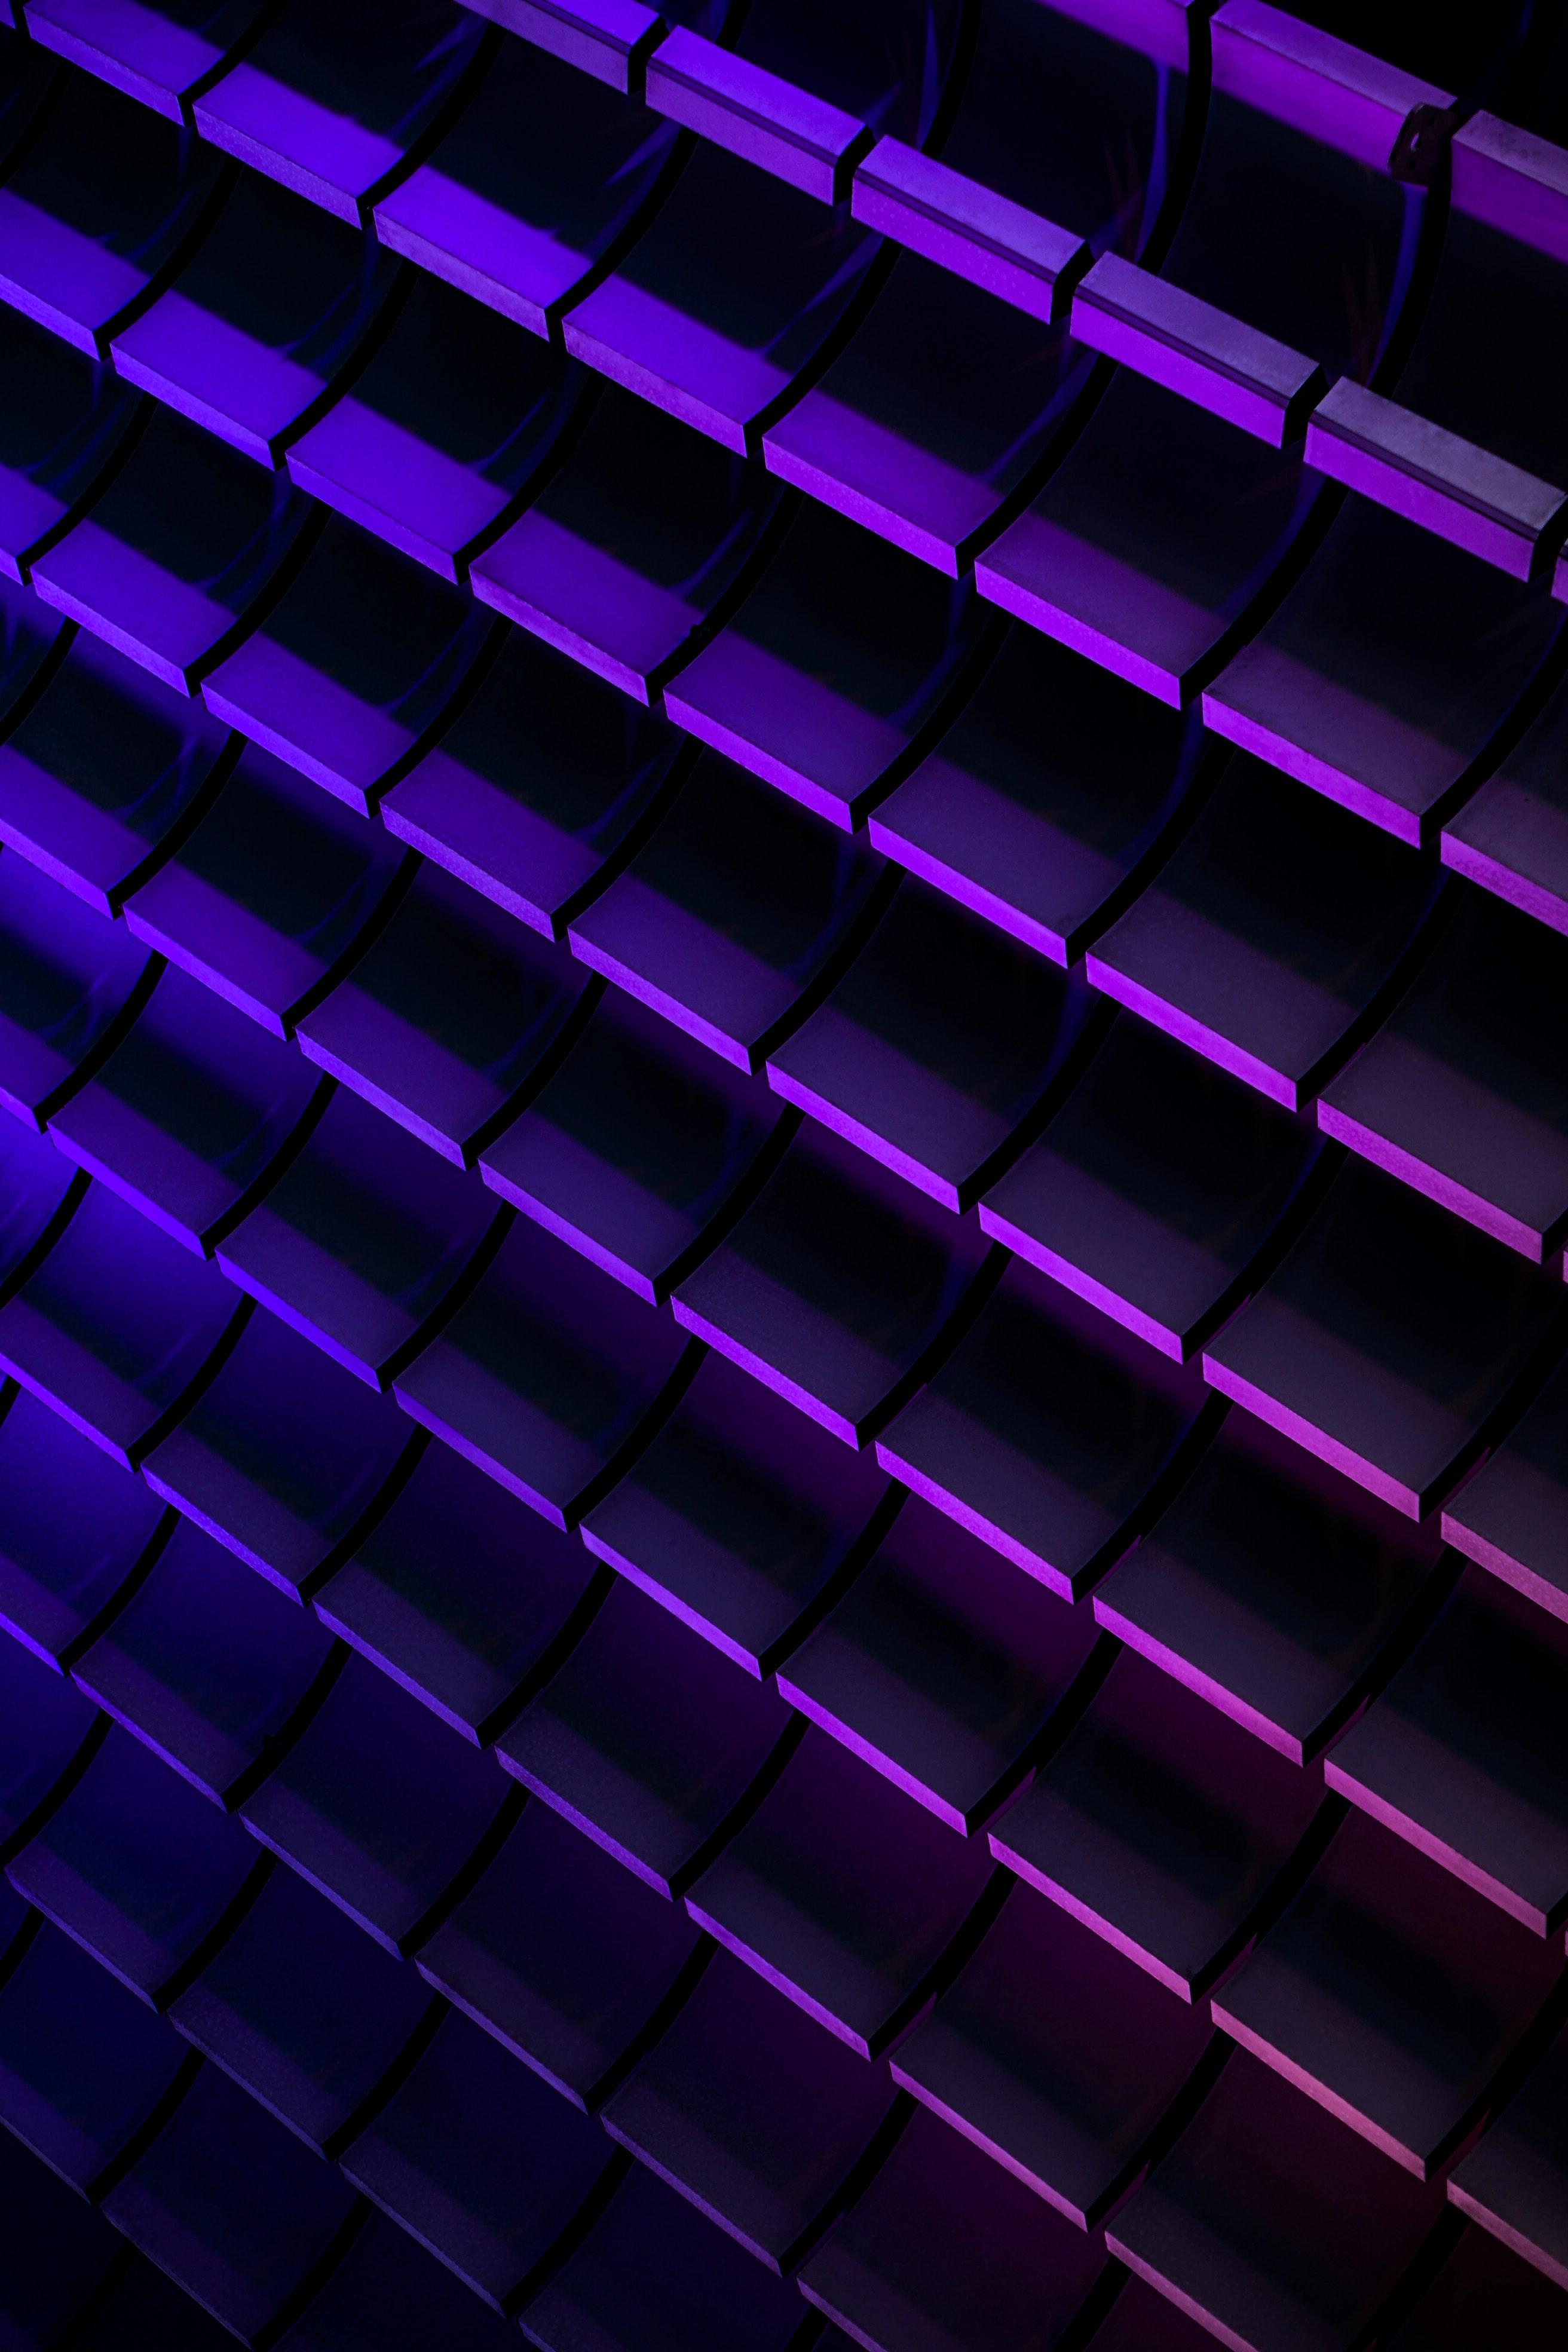 108960 Salvapantallas y fondos de pantalla Texturas en tu teléfono. Descarga imágenes de Texturas, Textura, Líneas, Lineas, Neón, Púrpura, Violeta gratis